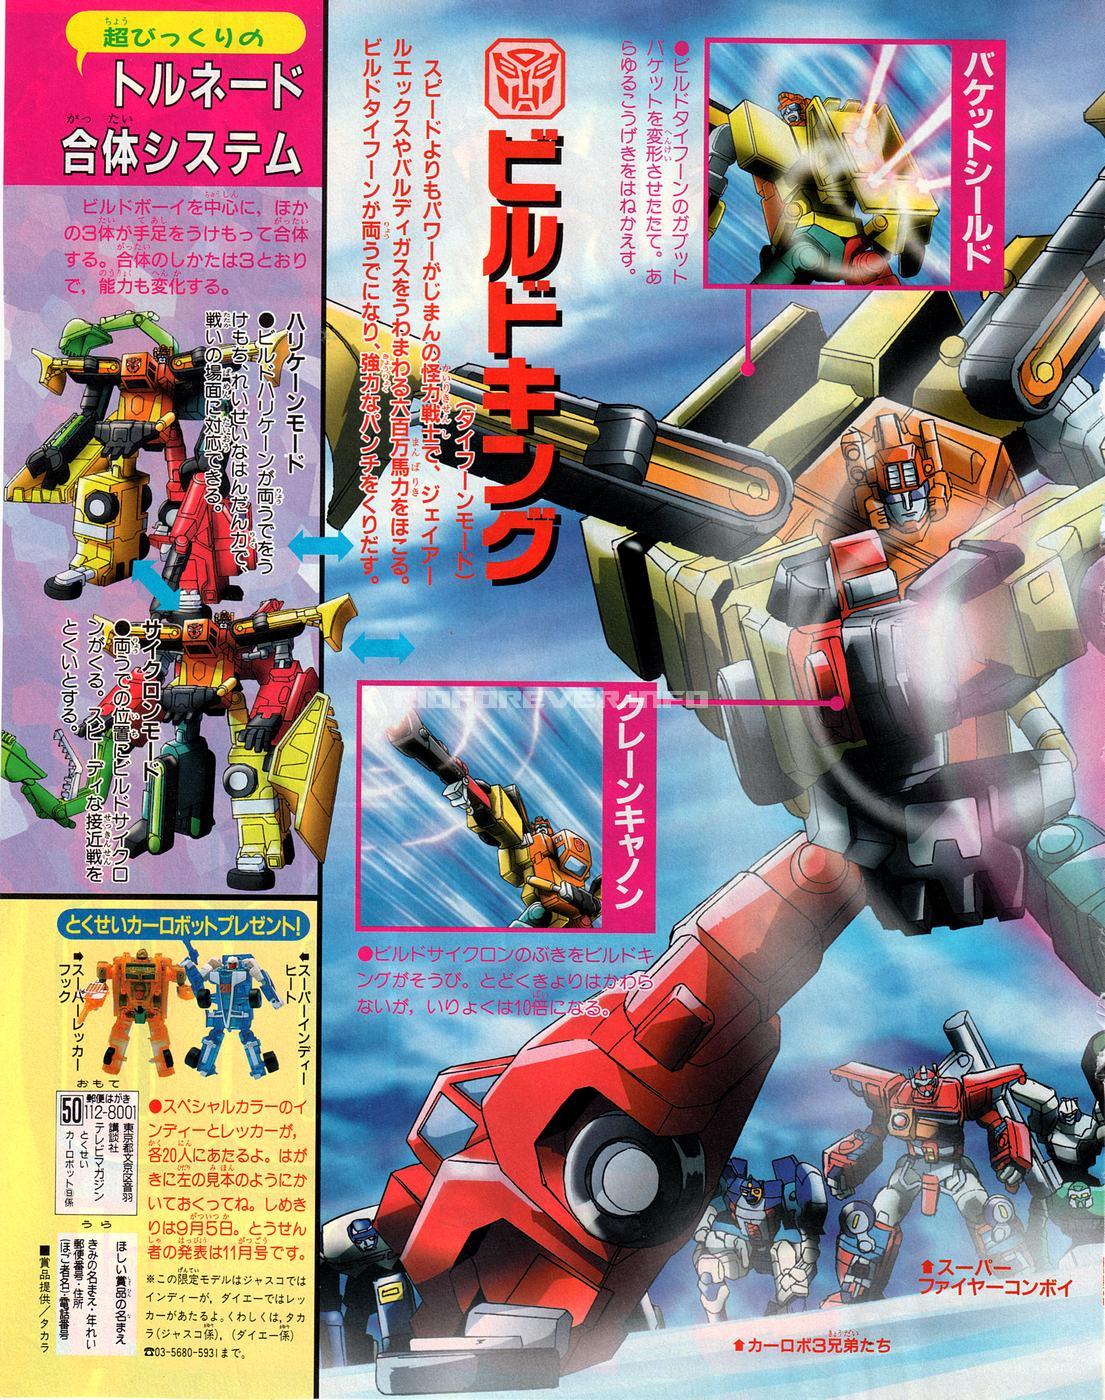 TV Magazine 2000-09-6